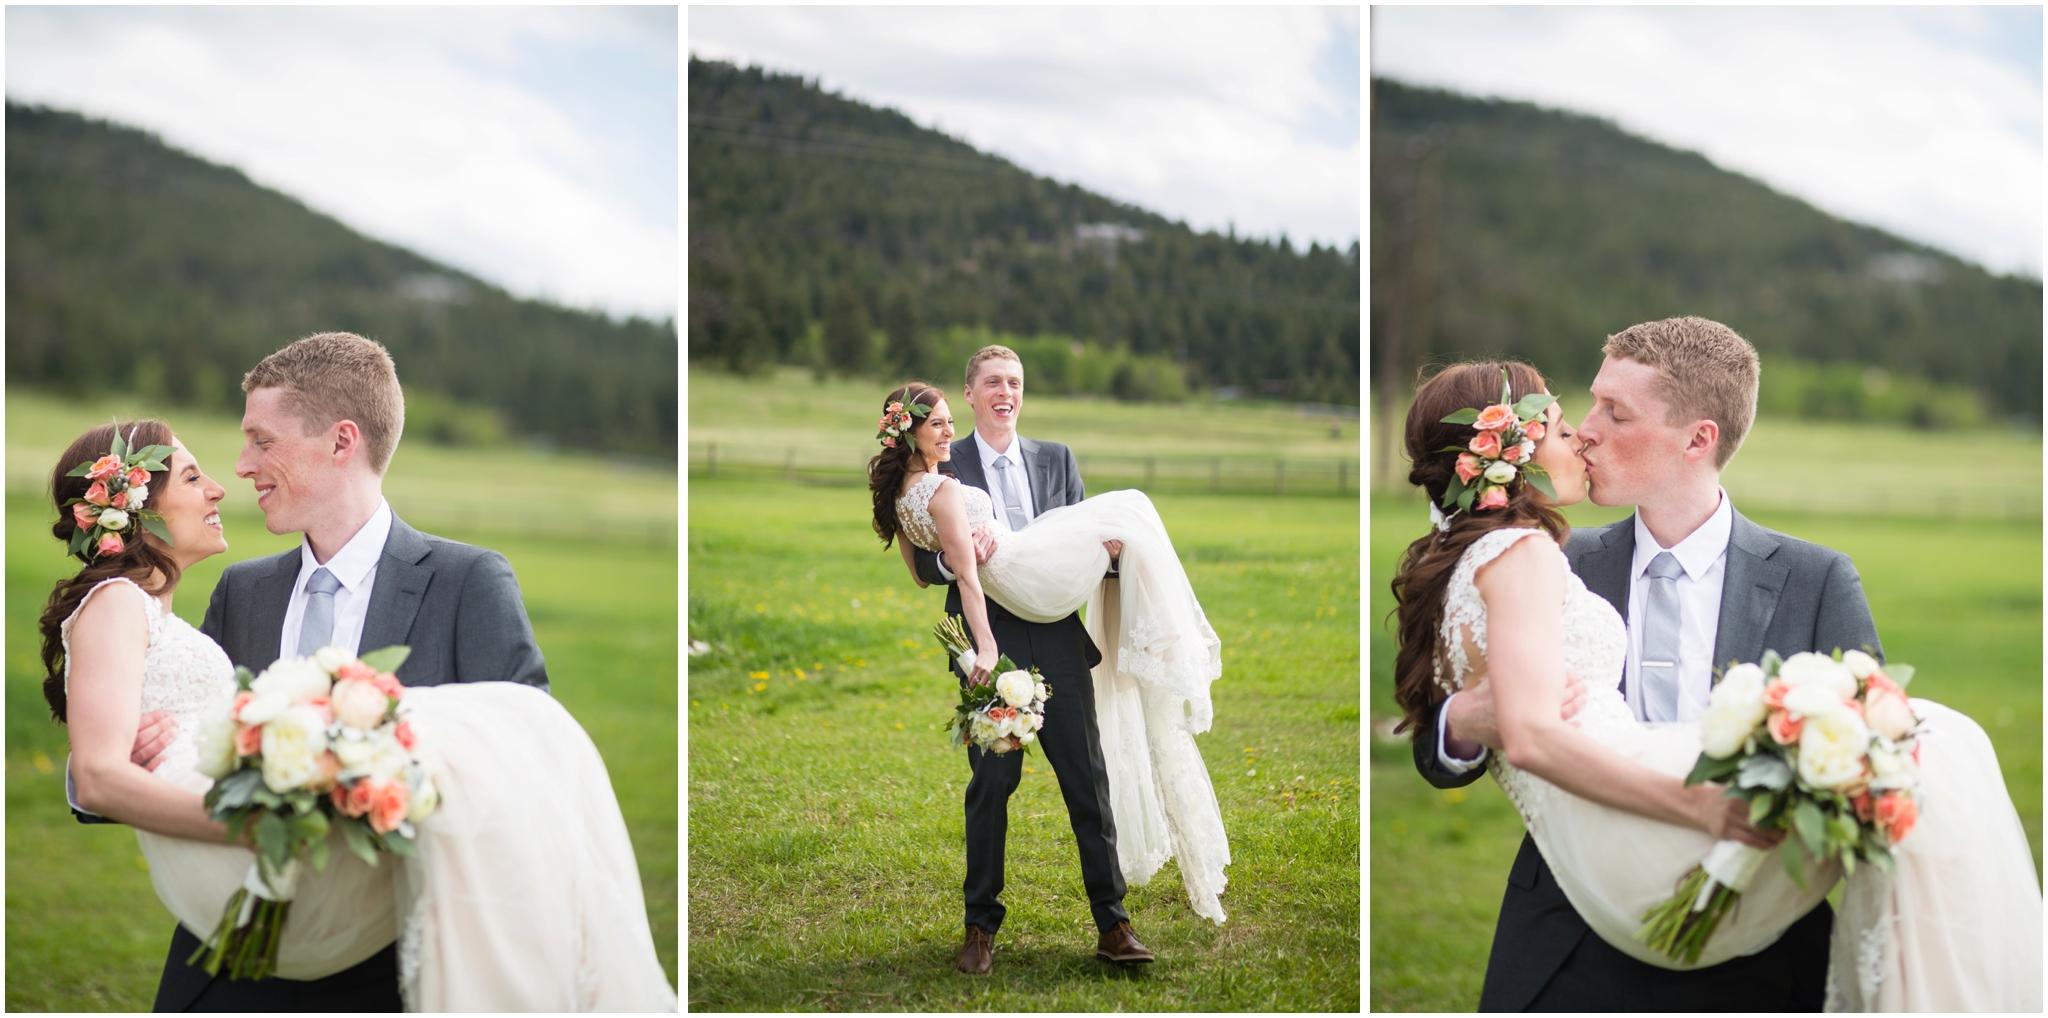 Best_Wedding_Photographers_in_Evergreen_Colorado.JPG